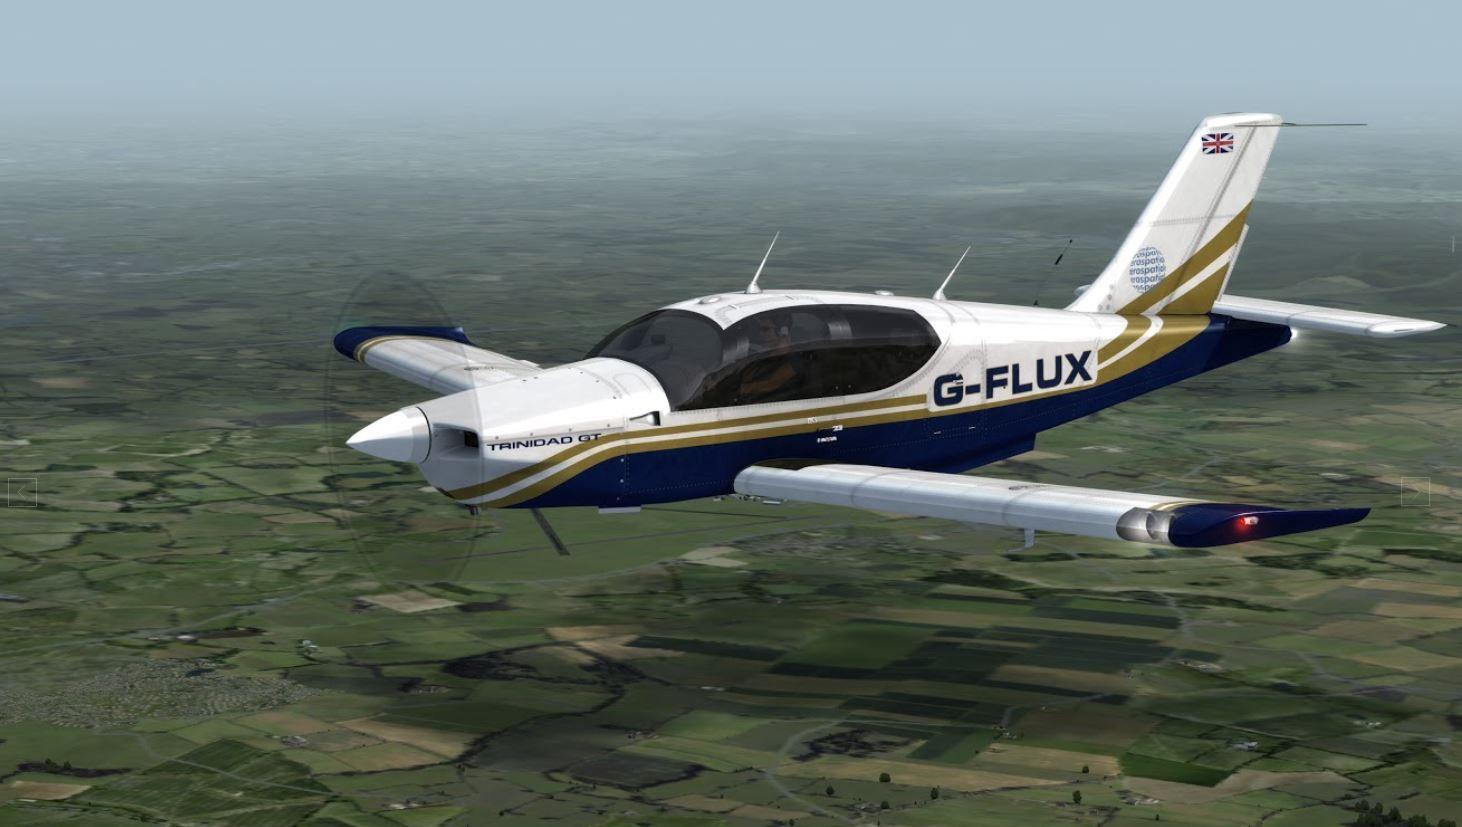 Trinidad Tb21 Gt In Gold And Blue Trinidad Lionheart Aircraft